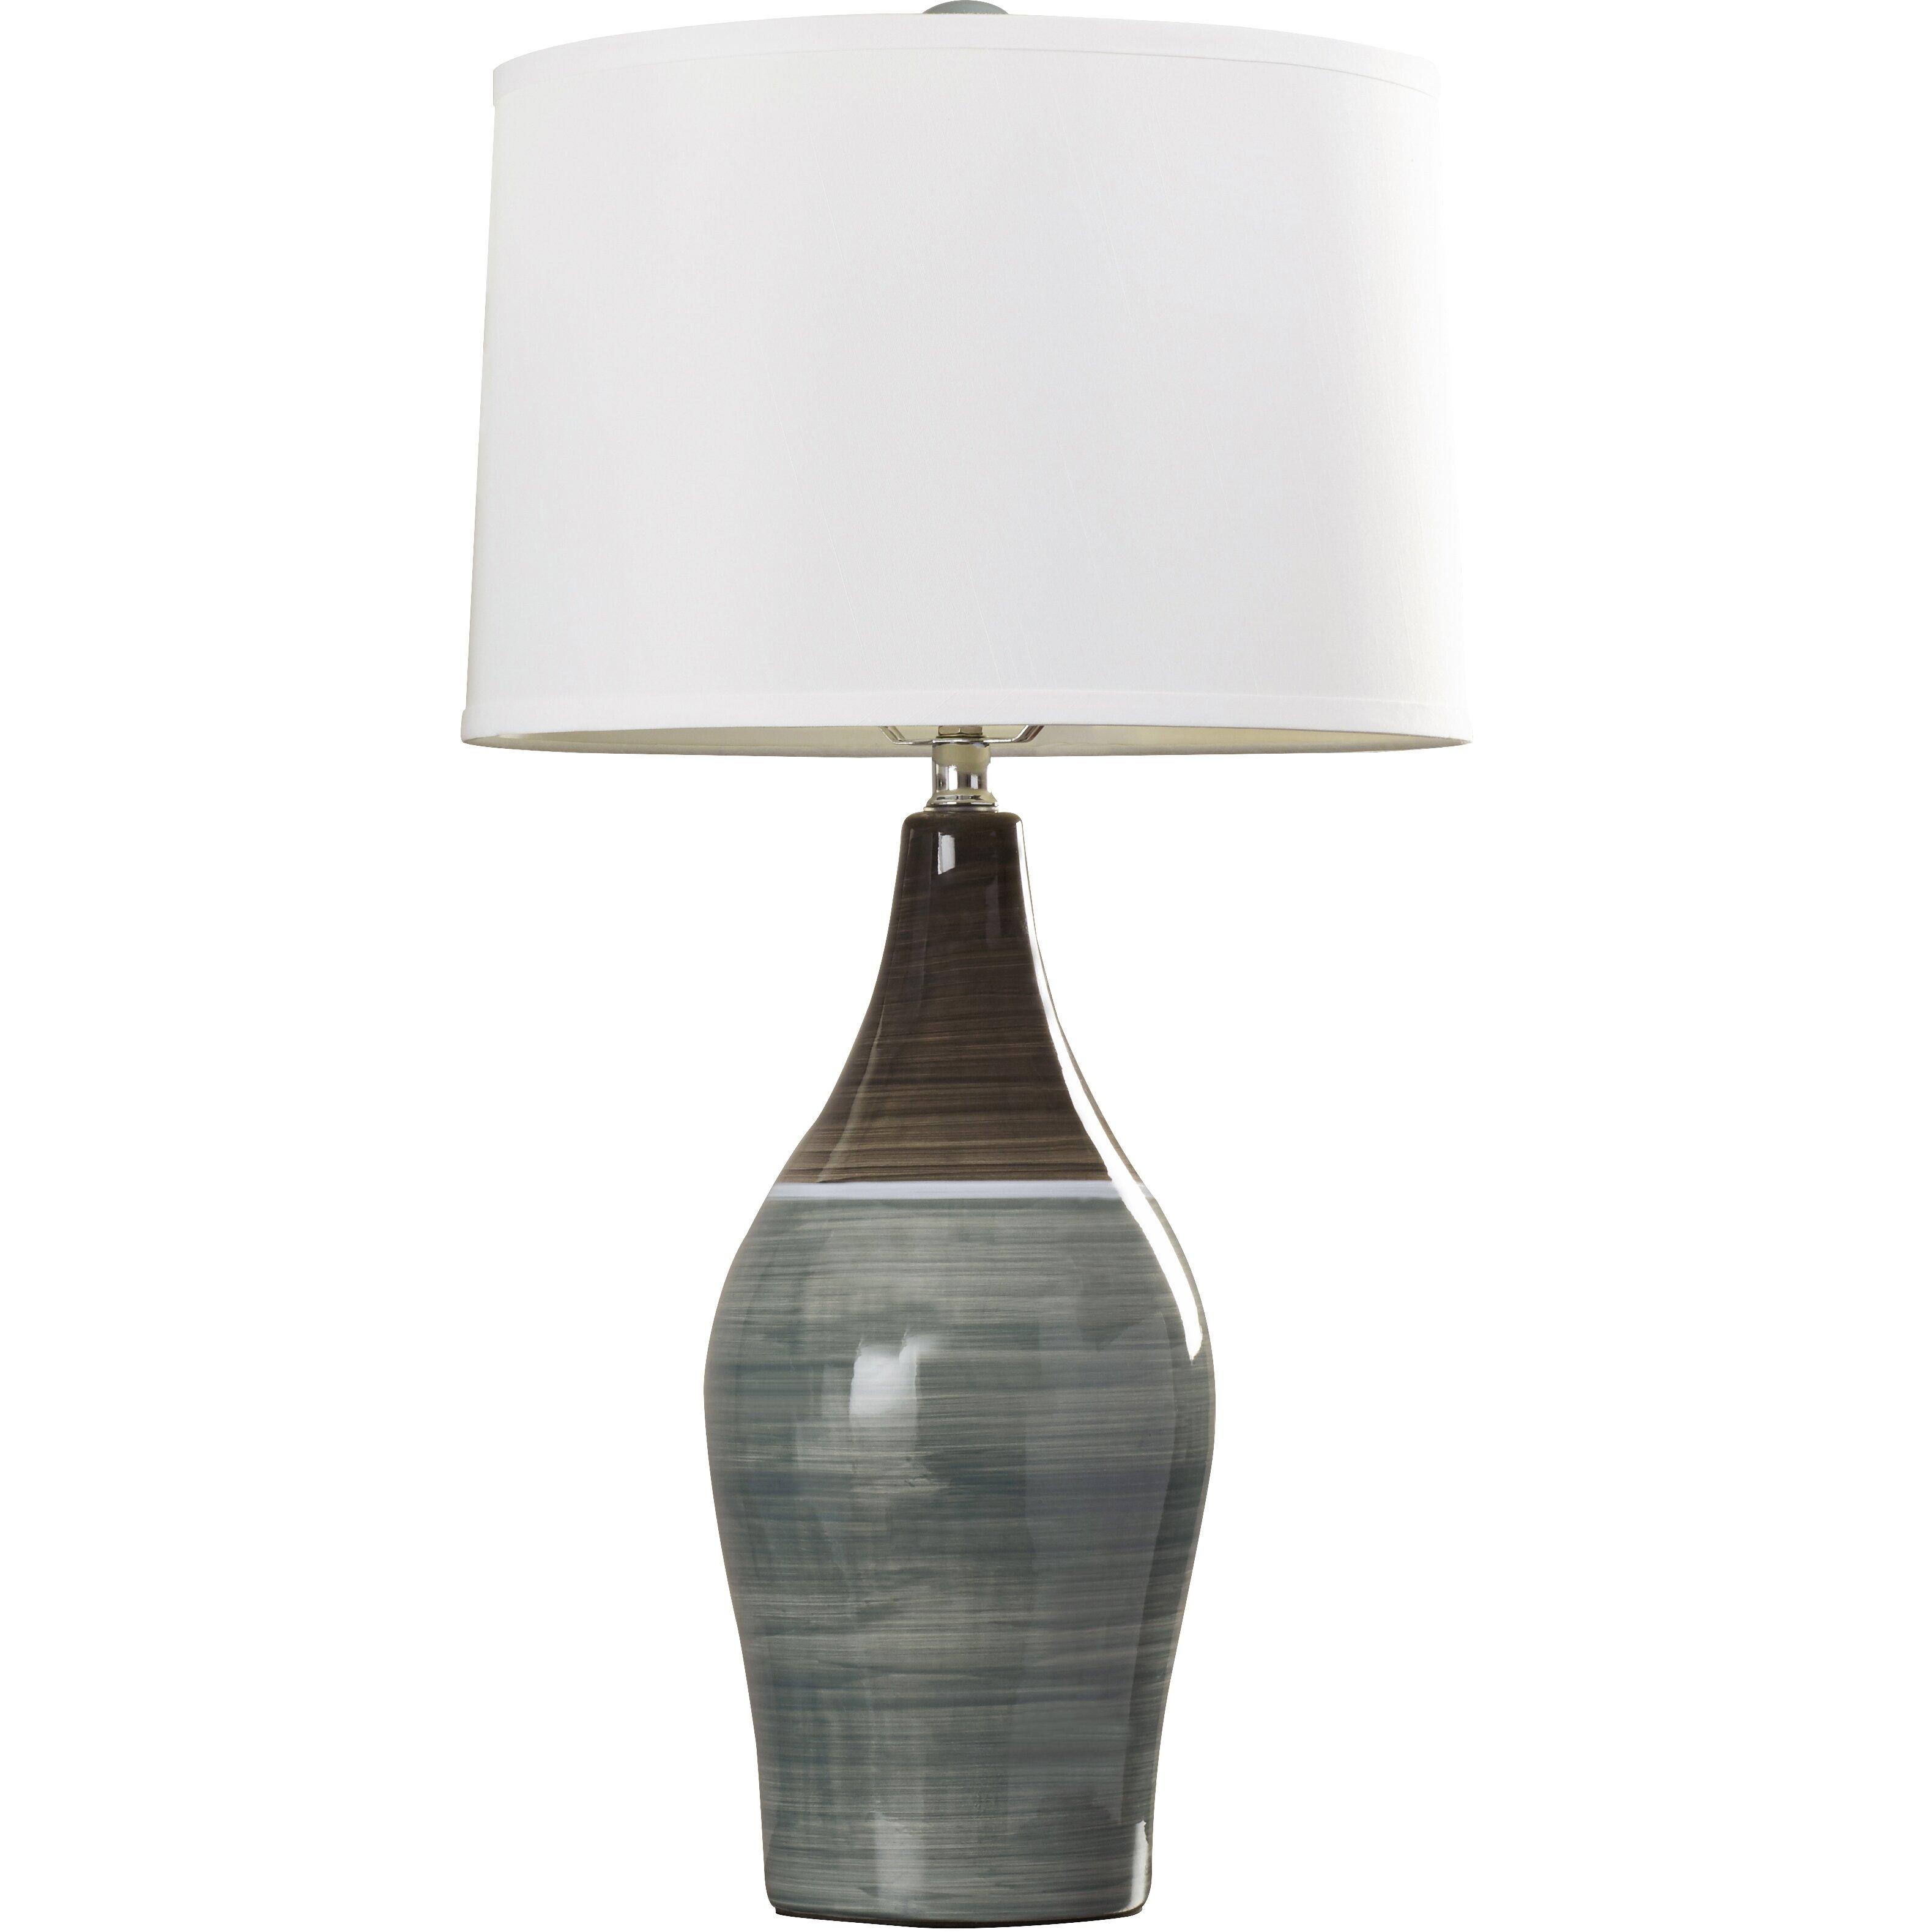 brayden studio carrillo 28 table lamps set of 2 reviews wayfair. Black Bedroom Furniture Sets. Home Design Ideas